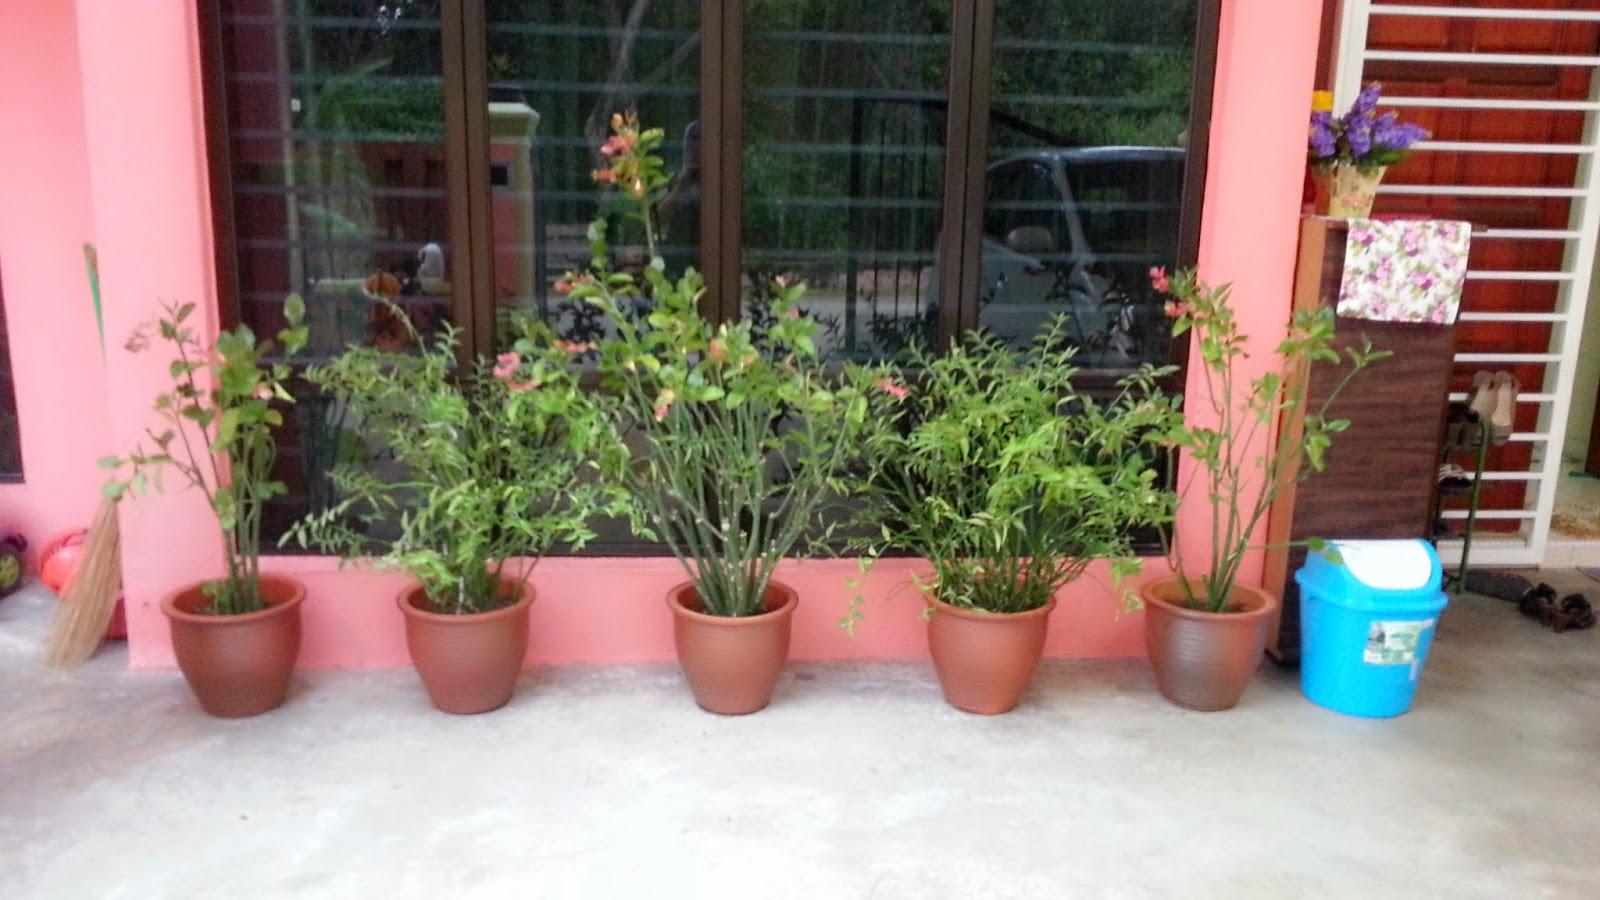 77 Pokok Bunga Hiasan Depan Rumah